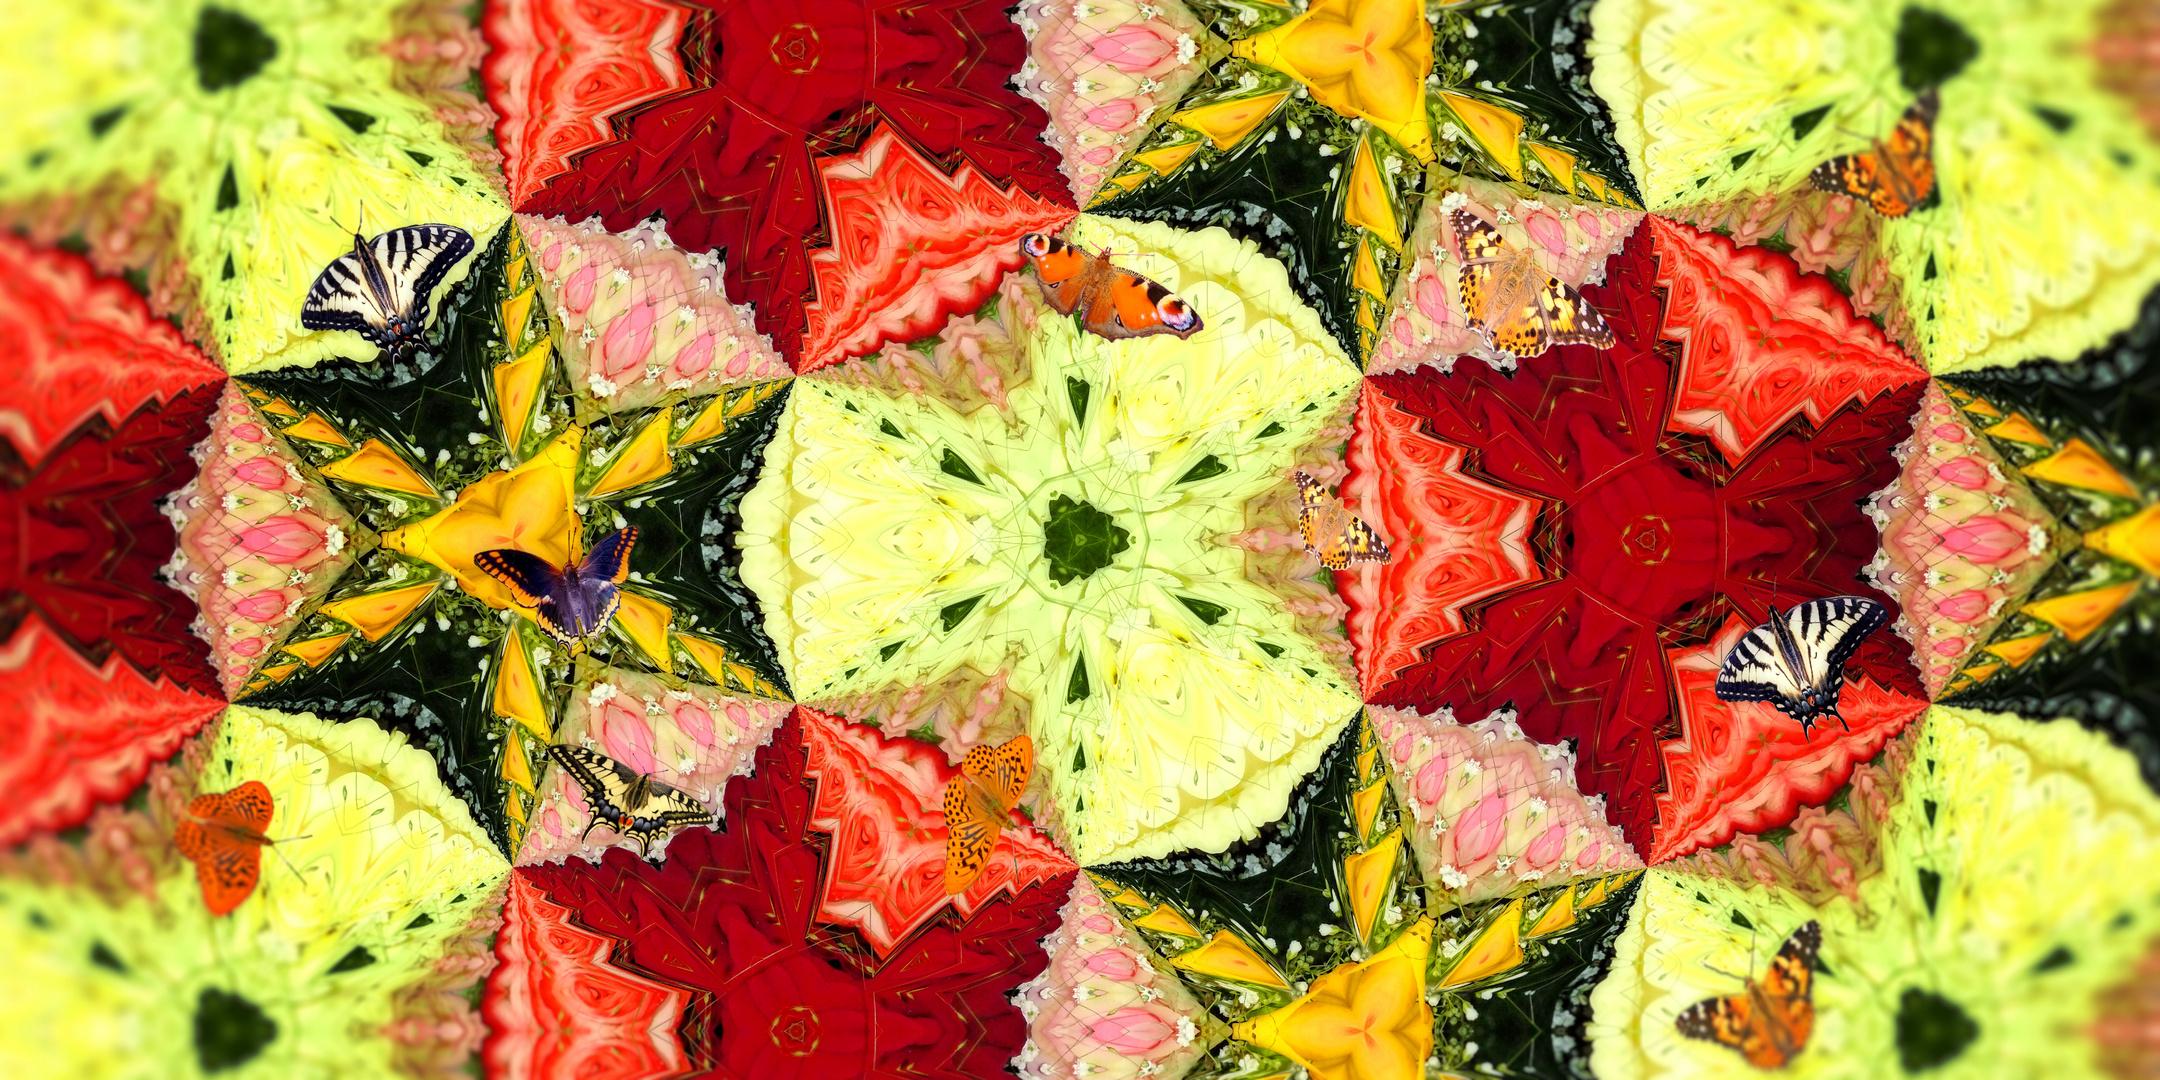 Butterflies in the Rose Garden_1